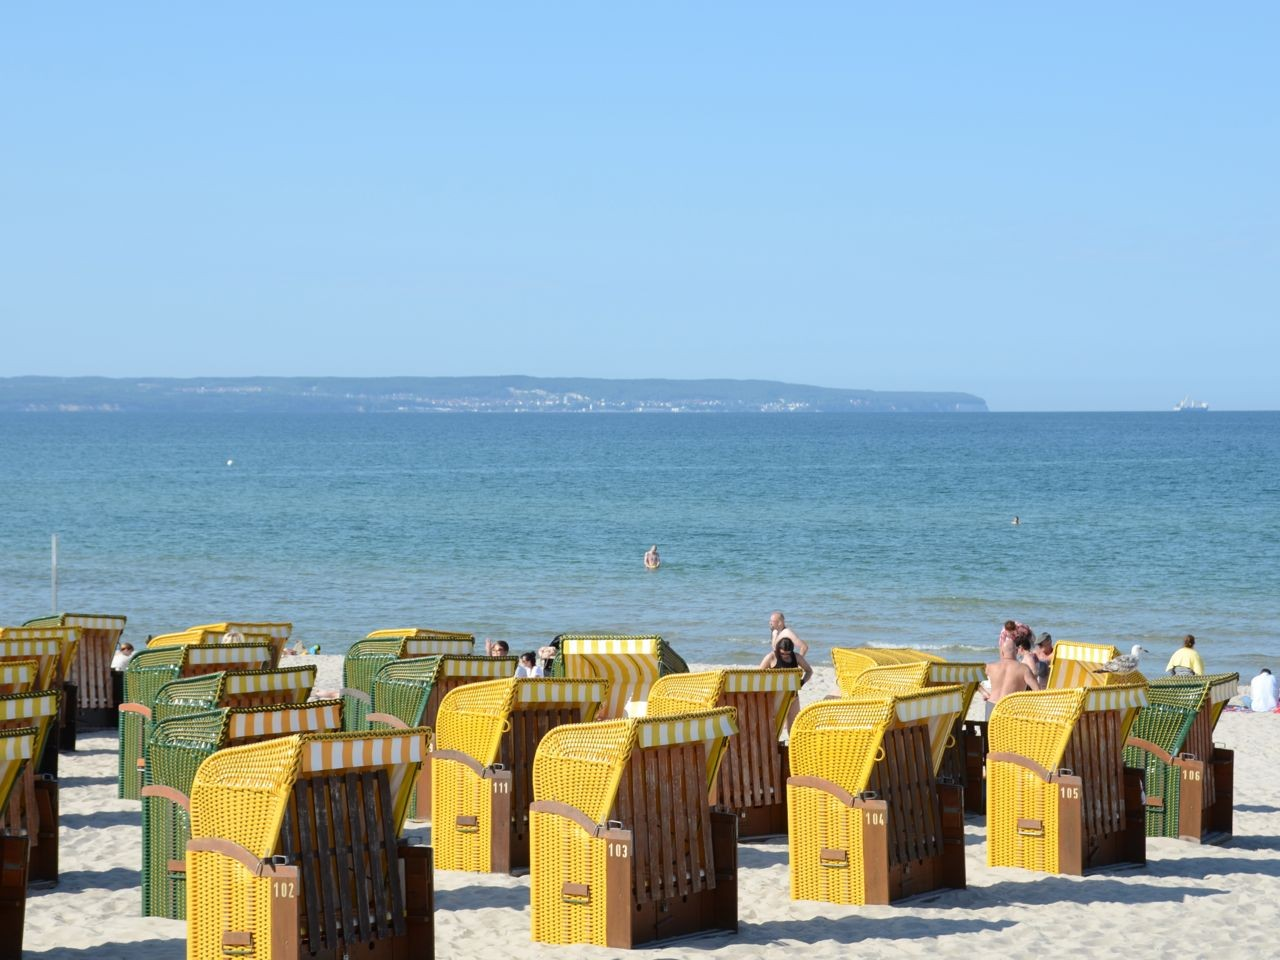 Binz Strandkörbe